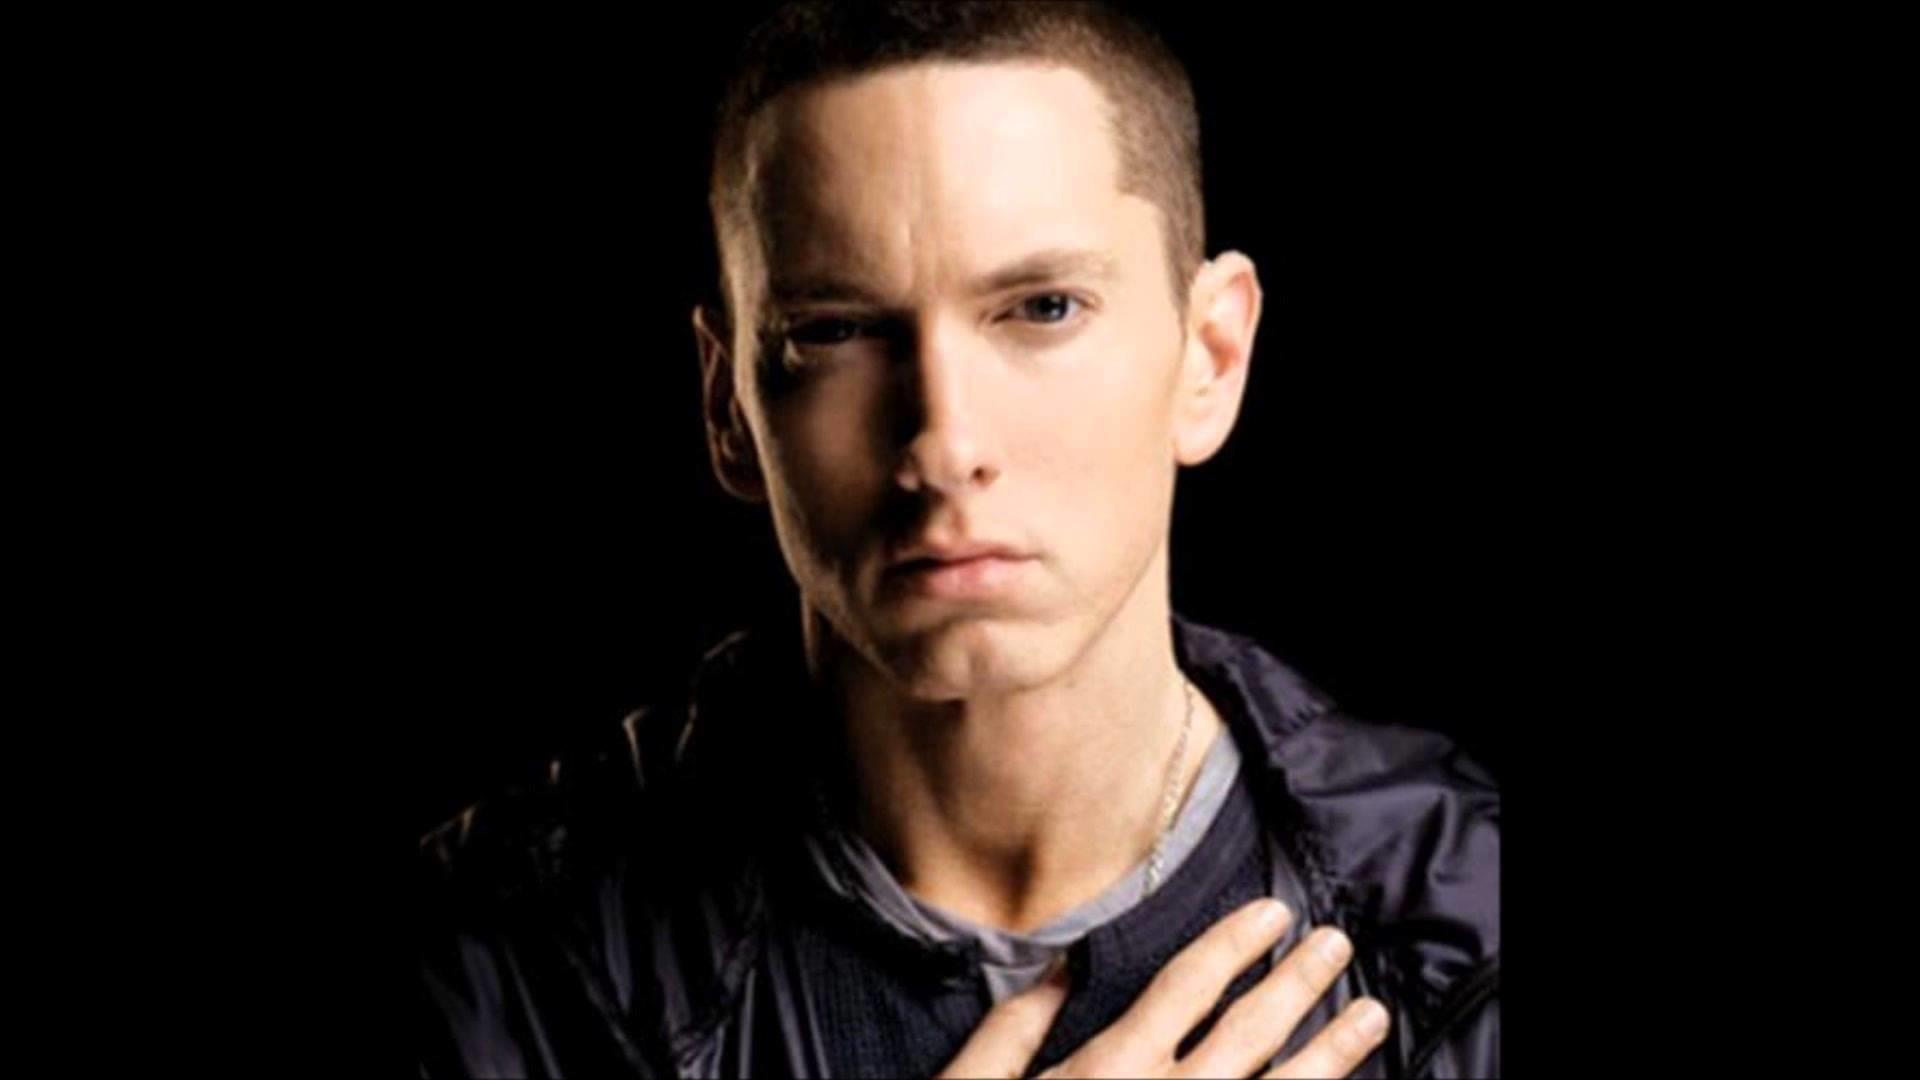 Eminem Wallpaper Hd 2018 Wallpapertag